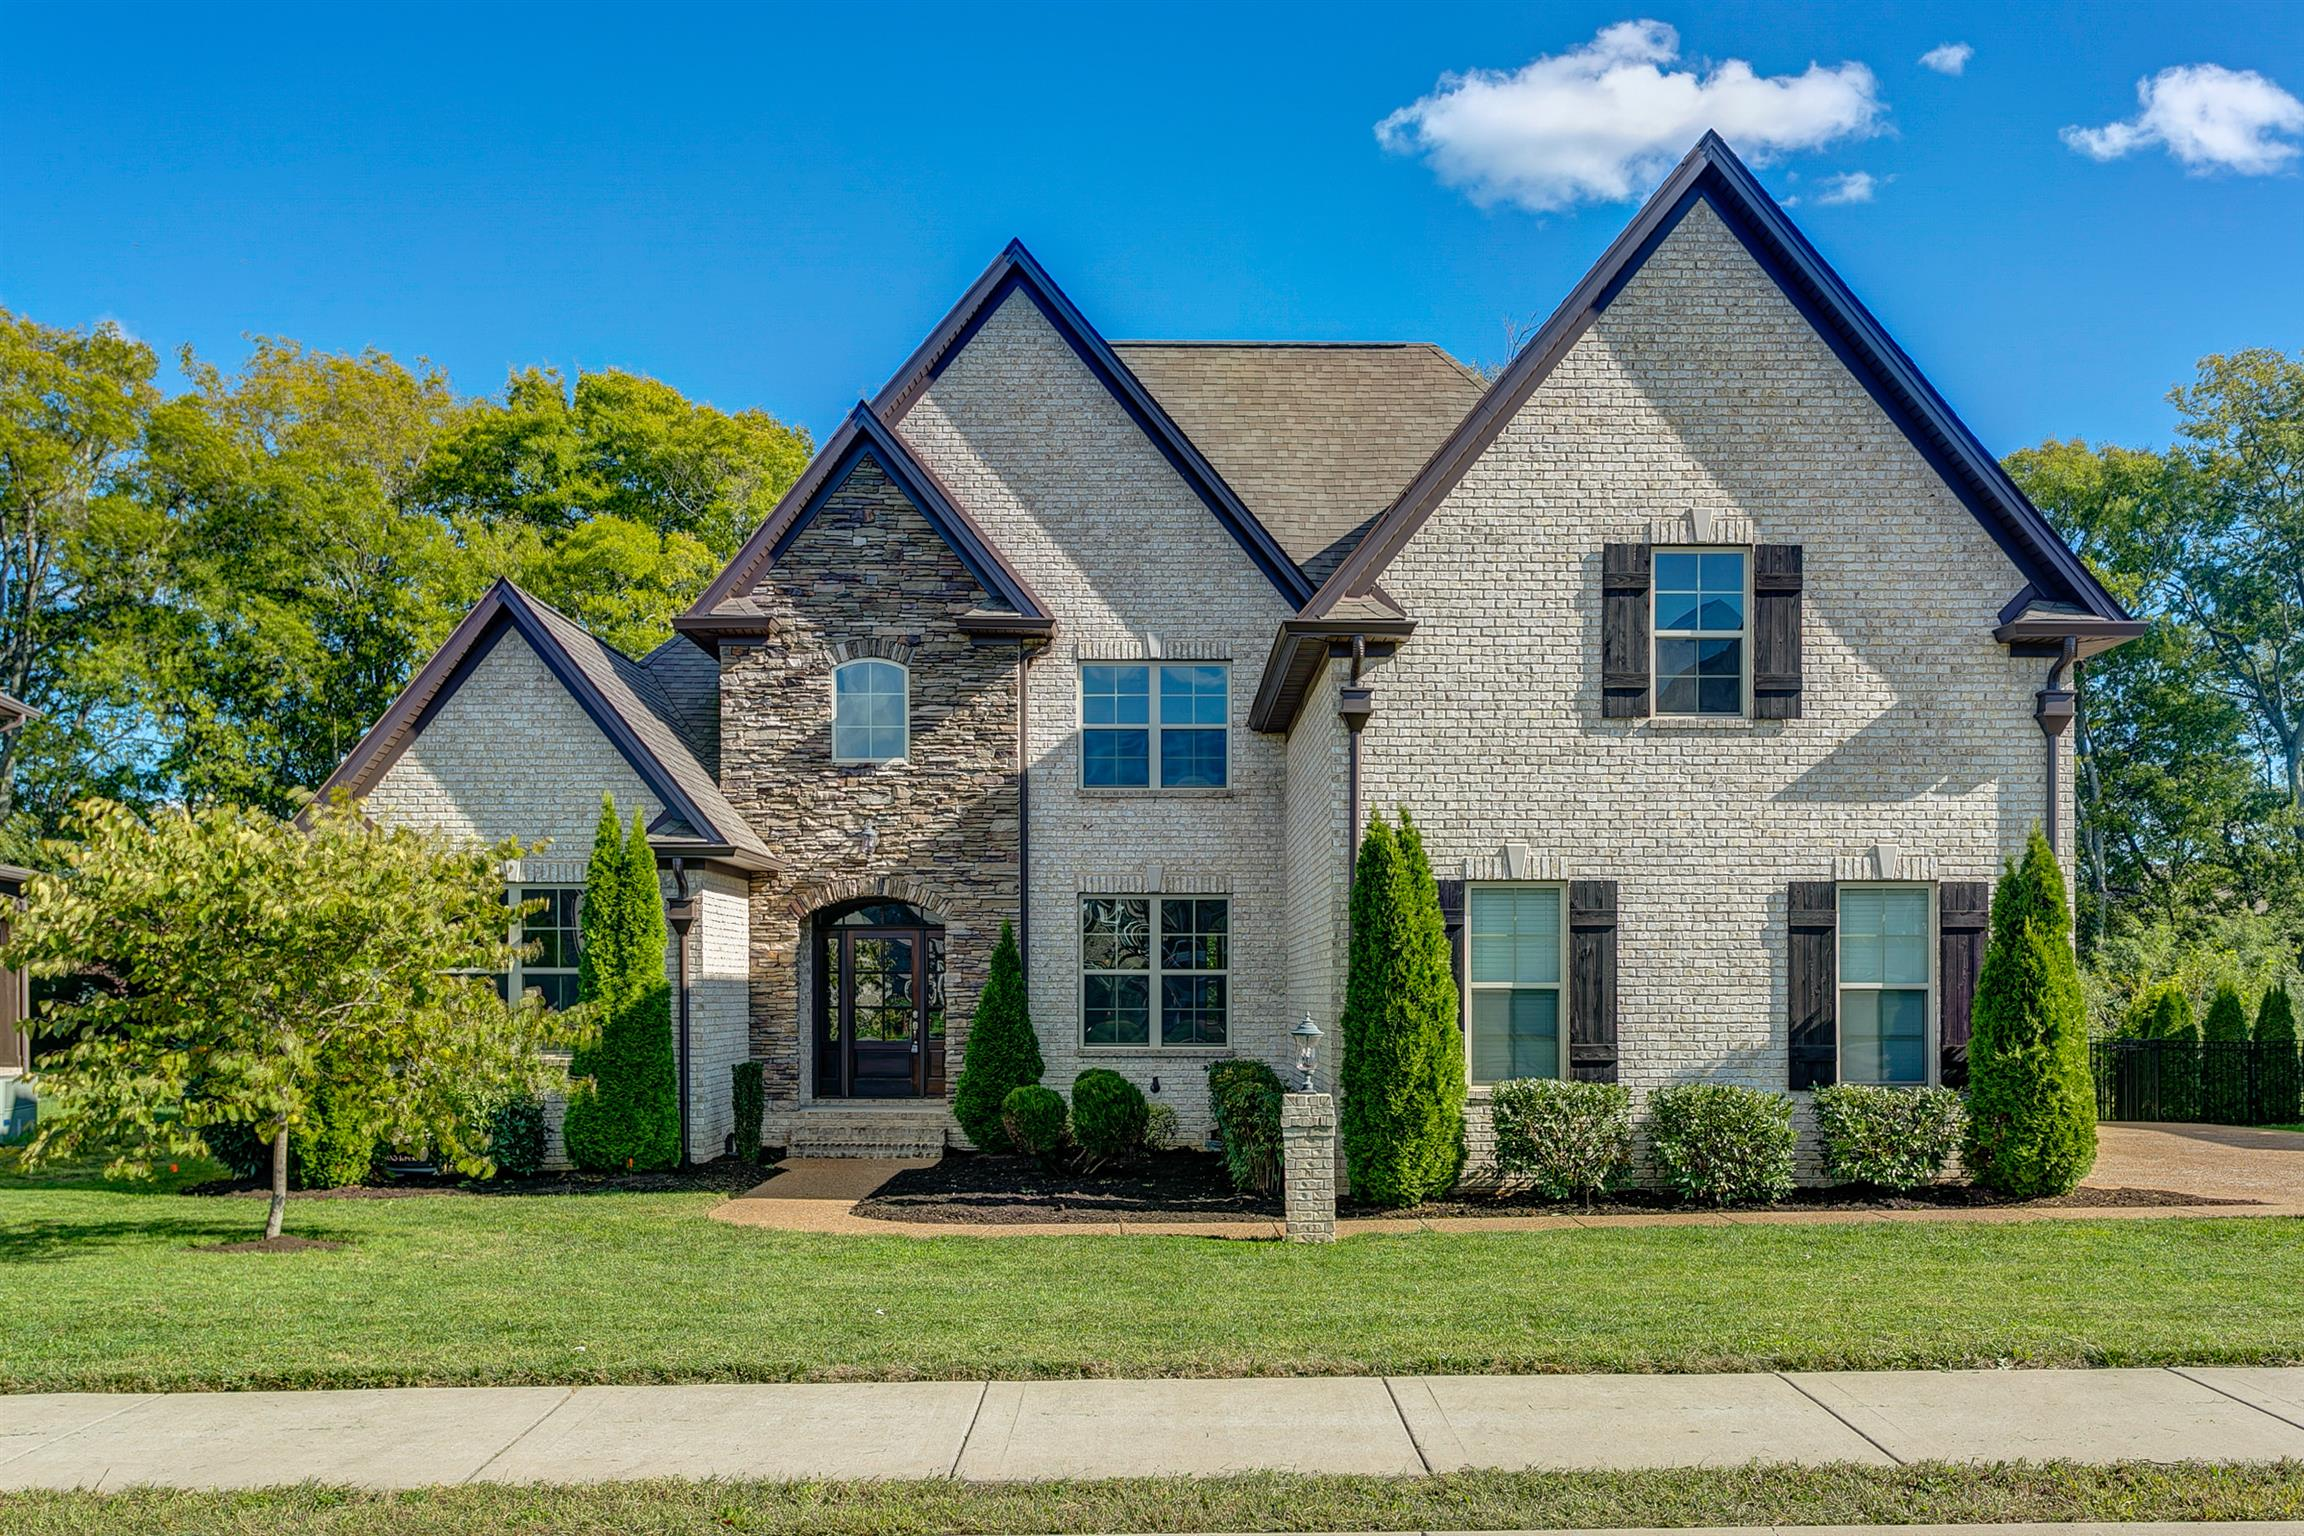 $619,900 - 6Br/5Ba -  for Sale in Autumn Ridge Ph5, Spring Hill